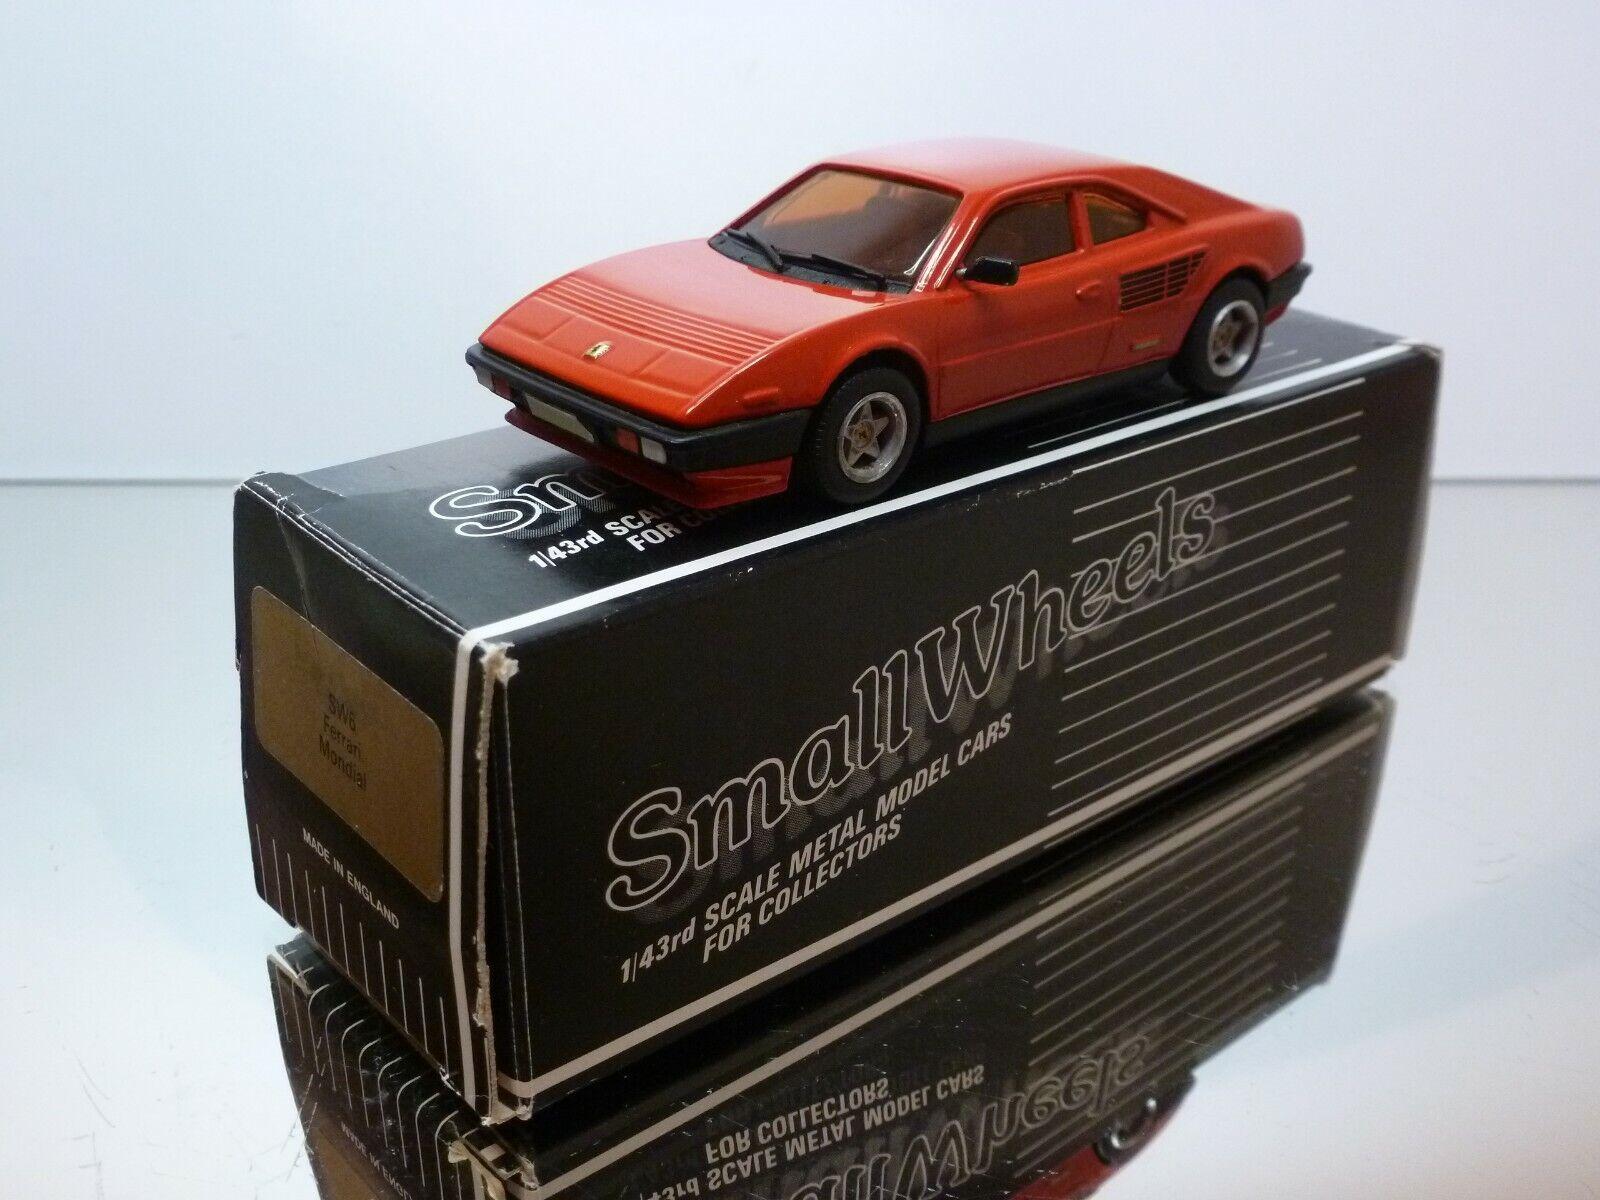 SMALL WHEELS WESTERN MODELS SW6 FERRARI MONDIAL - rojo 1 43 - VERY GOOD IN BOX